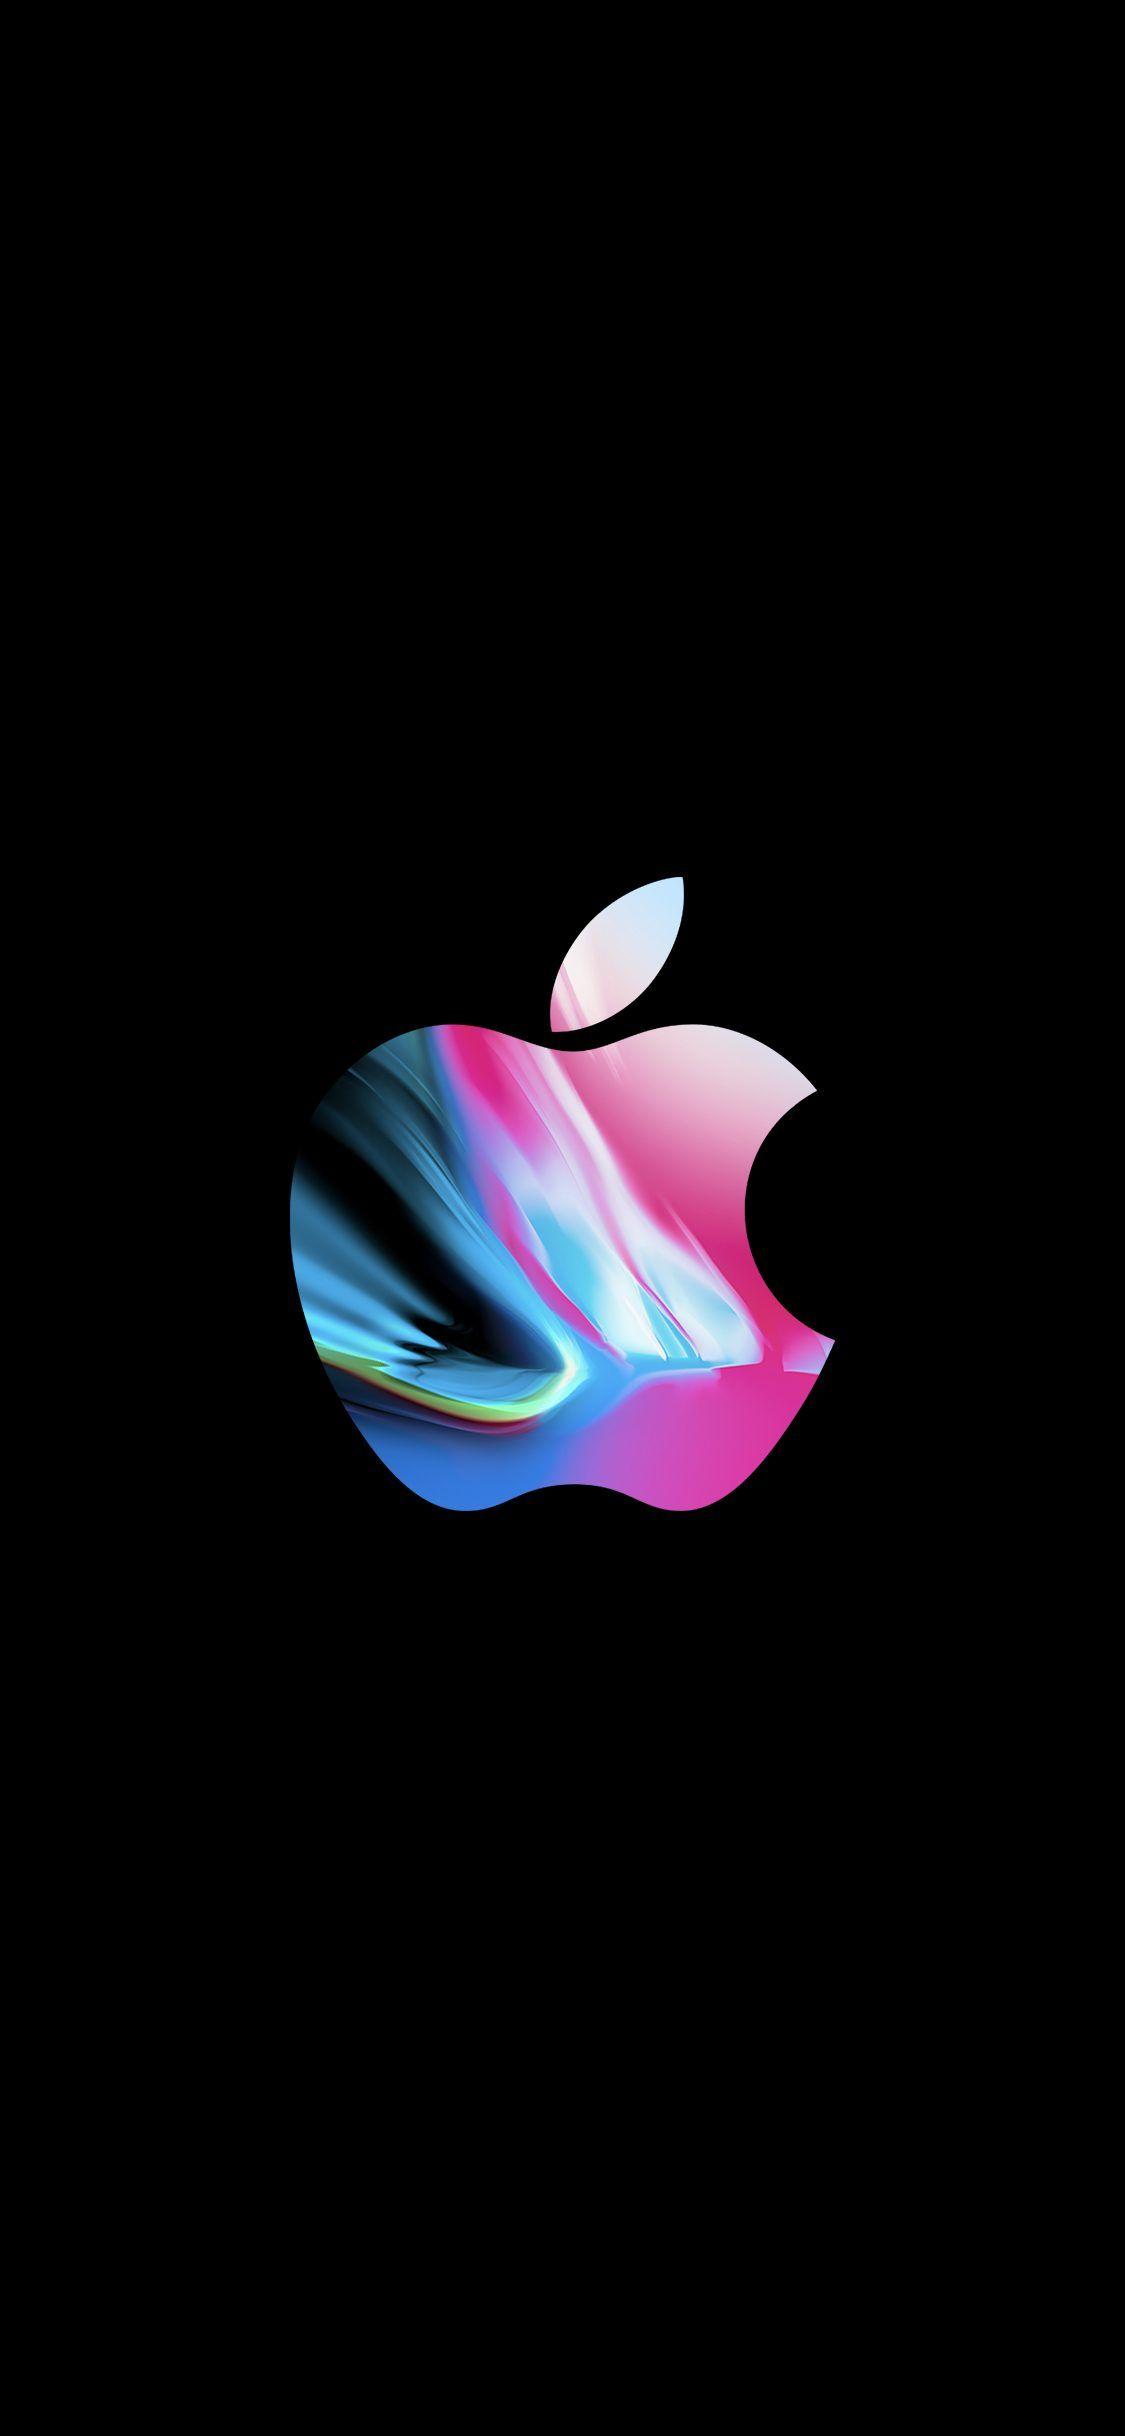 40 Gambar Wallpaper Apple Iphone X Terbaru 2020 Di 2020 Apple Iphone Apple Logo Iphone